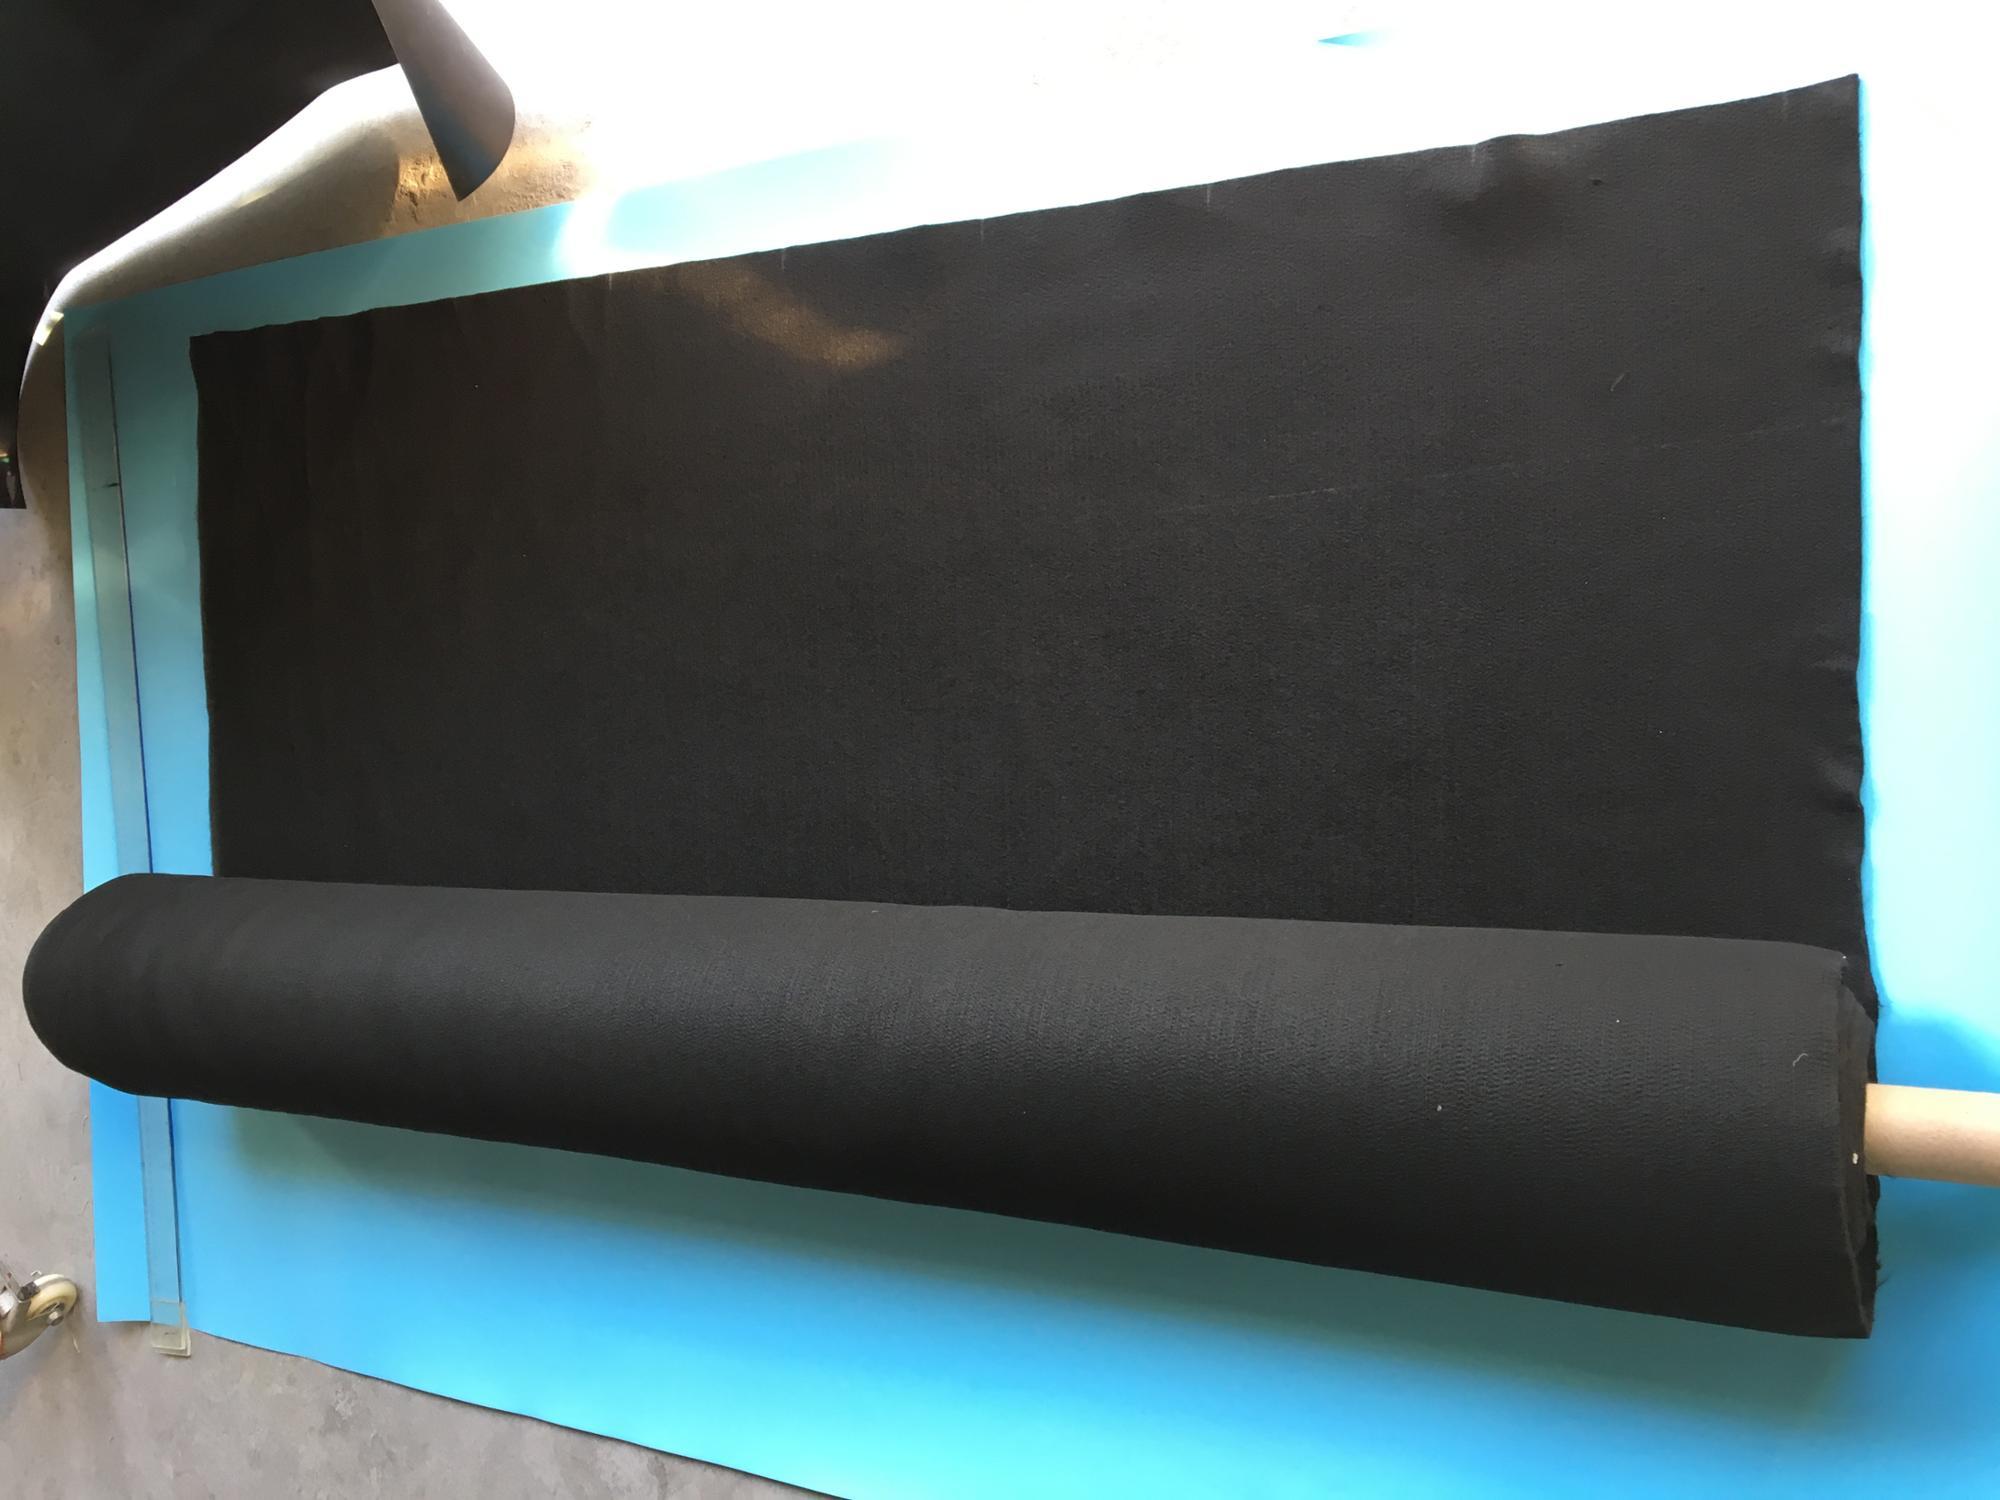 temp mats high tul plumbers thick x felt amazon com fireproof mat dp black pad